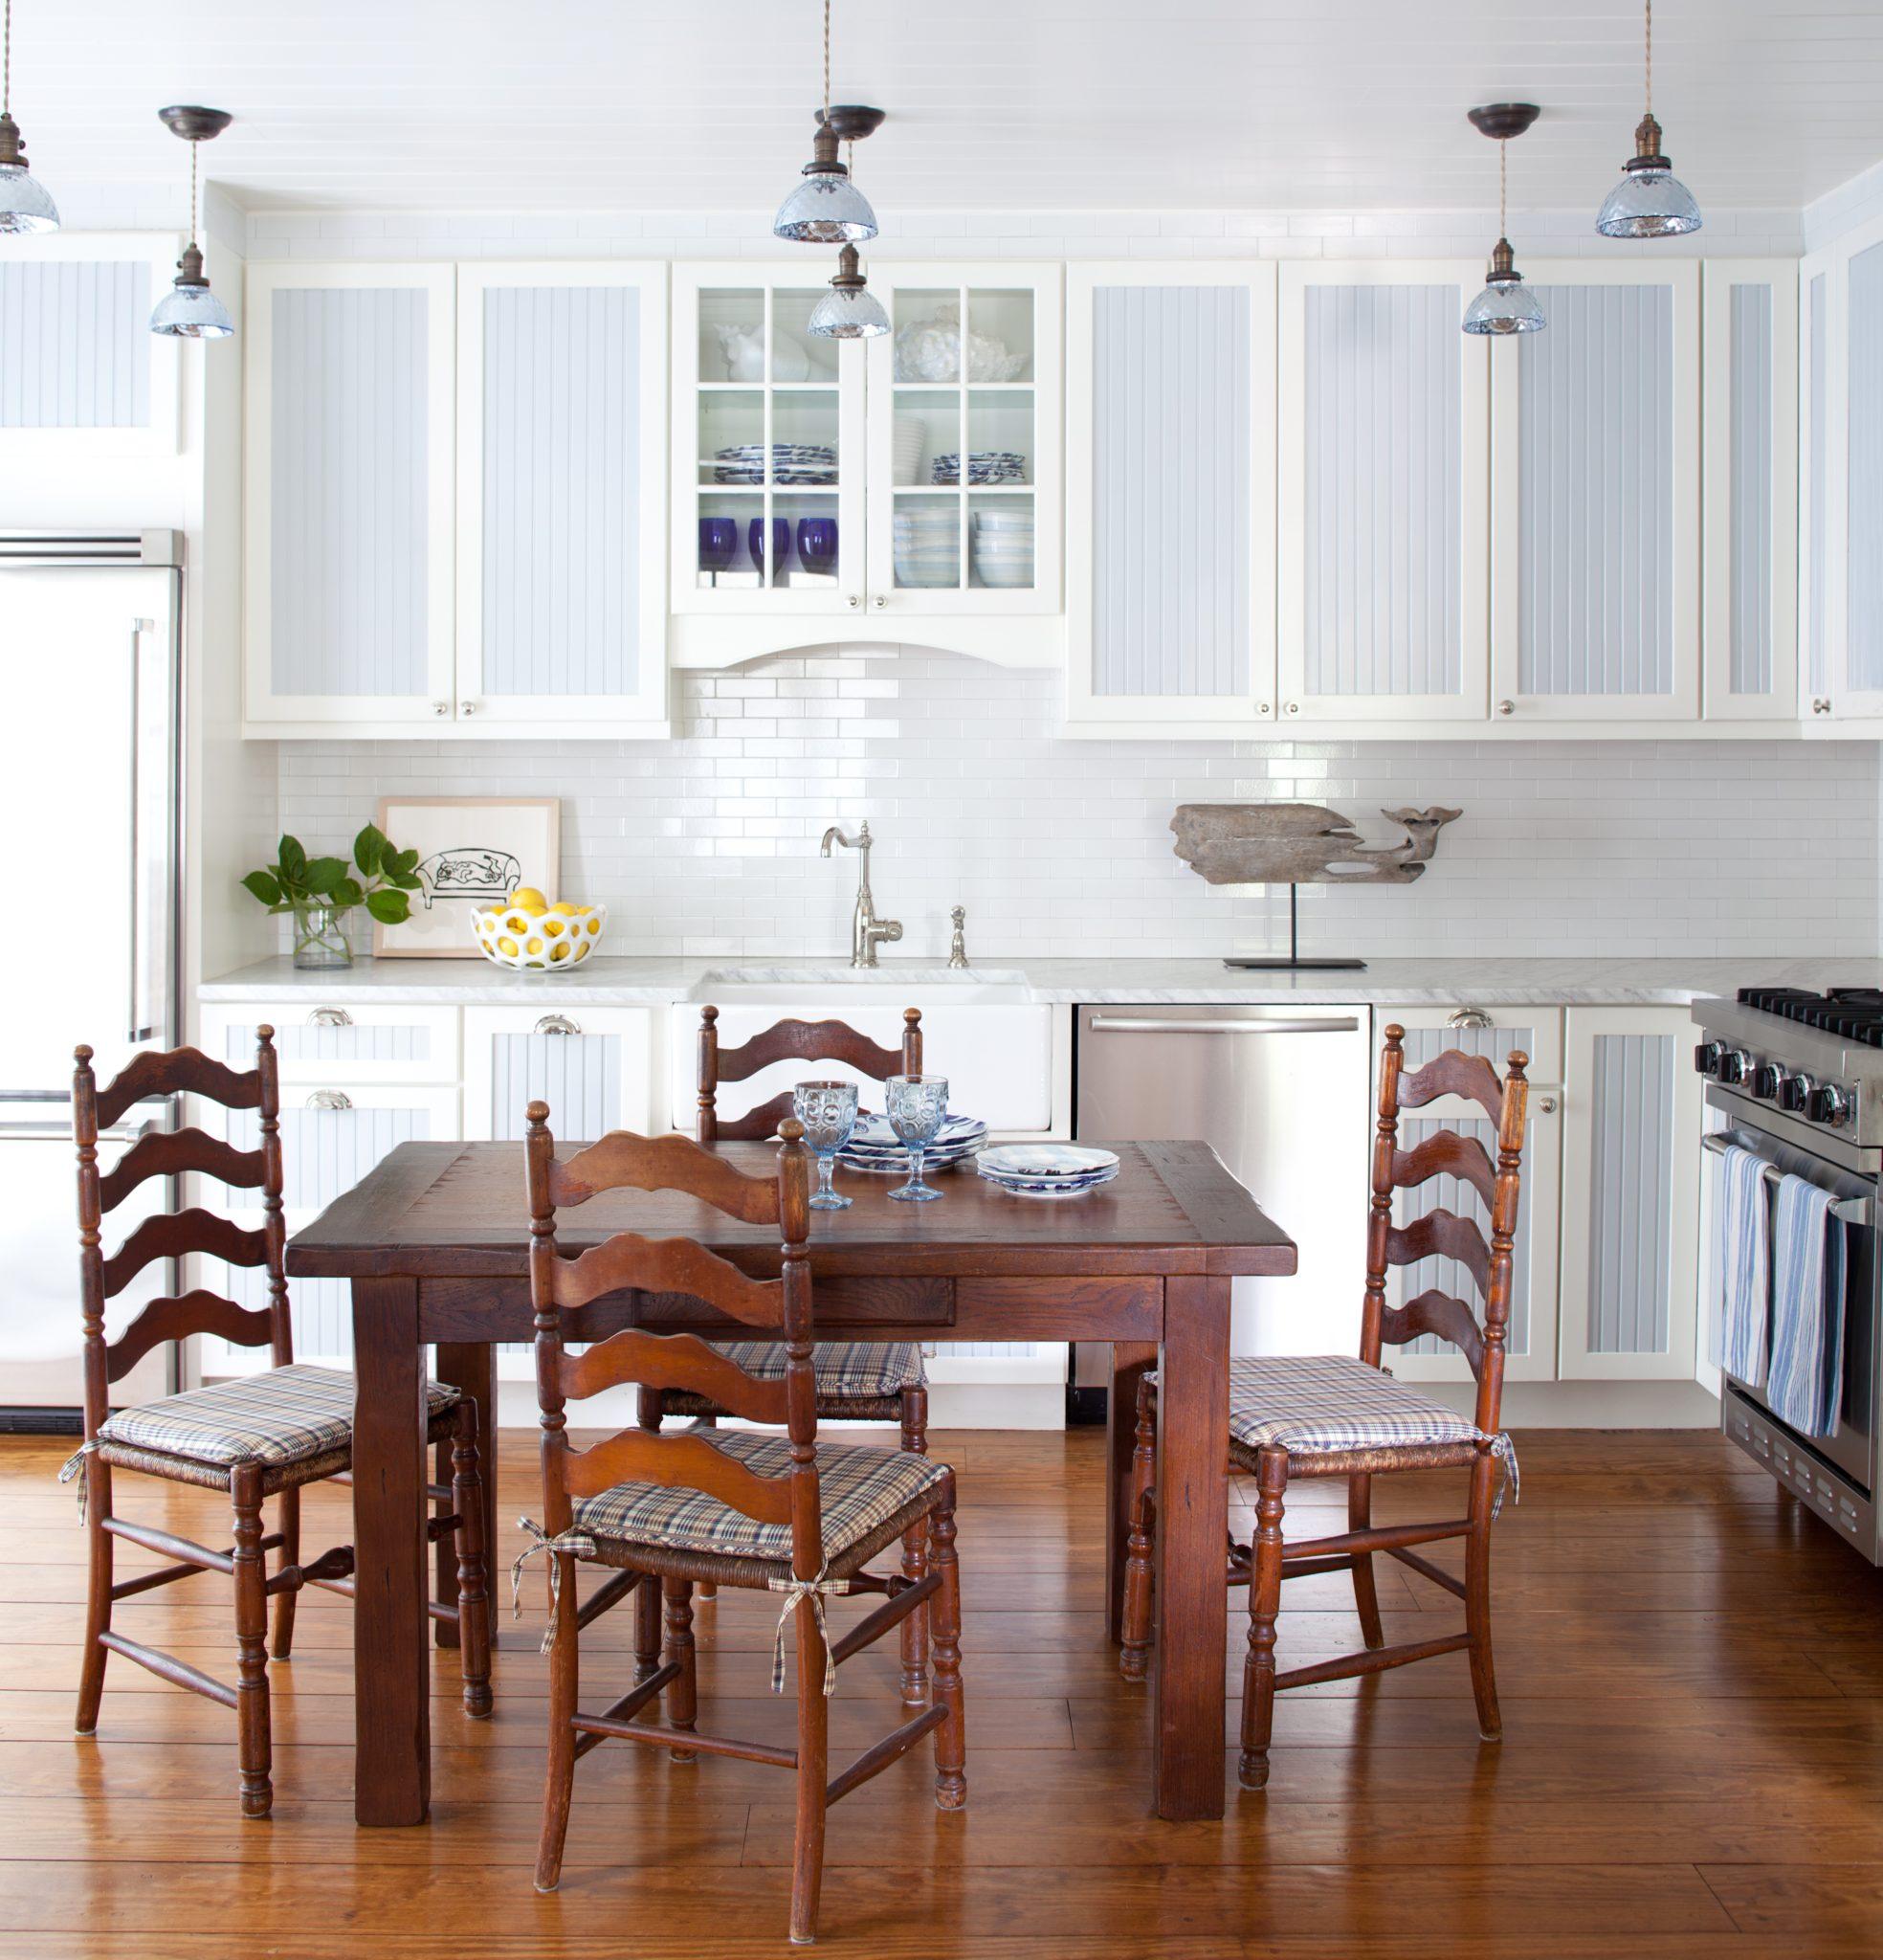 Southampton cottage kitchen by Hernandez Greene